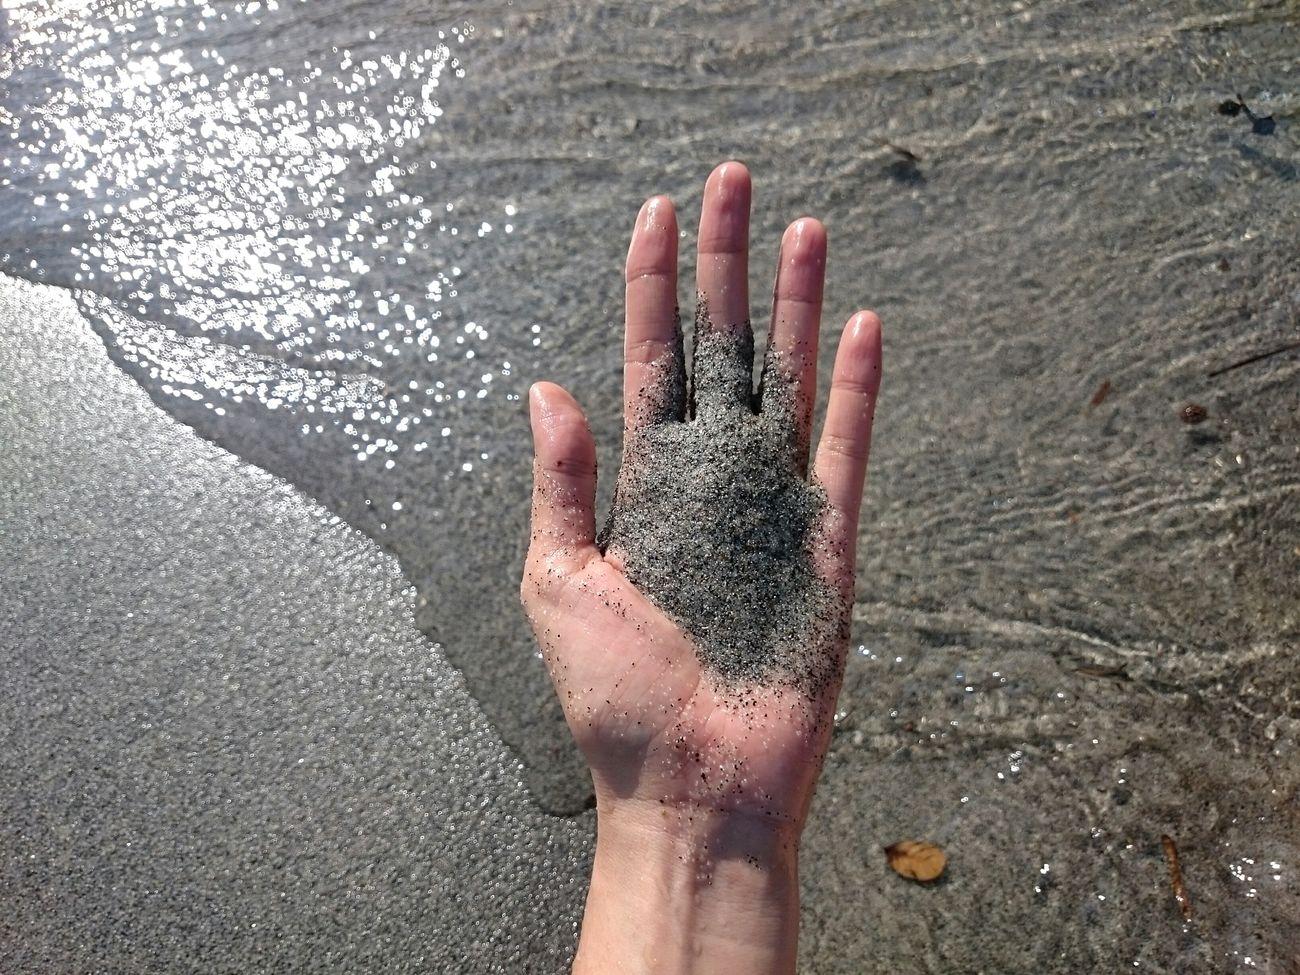 Anawangin AnawanginCove Zambales Mtpinatuboashes Beach Sand Gray Hand People Of The Ocean Feel The Journey